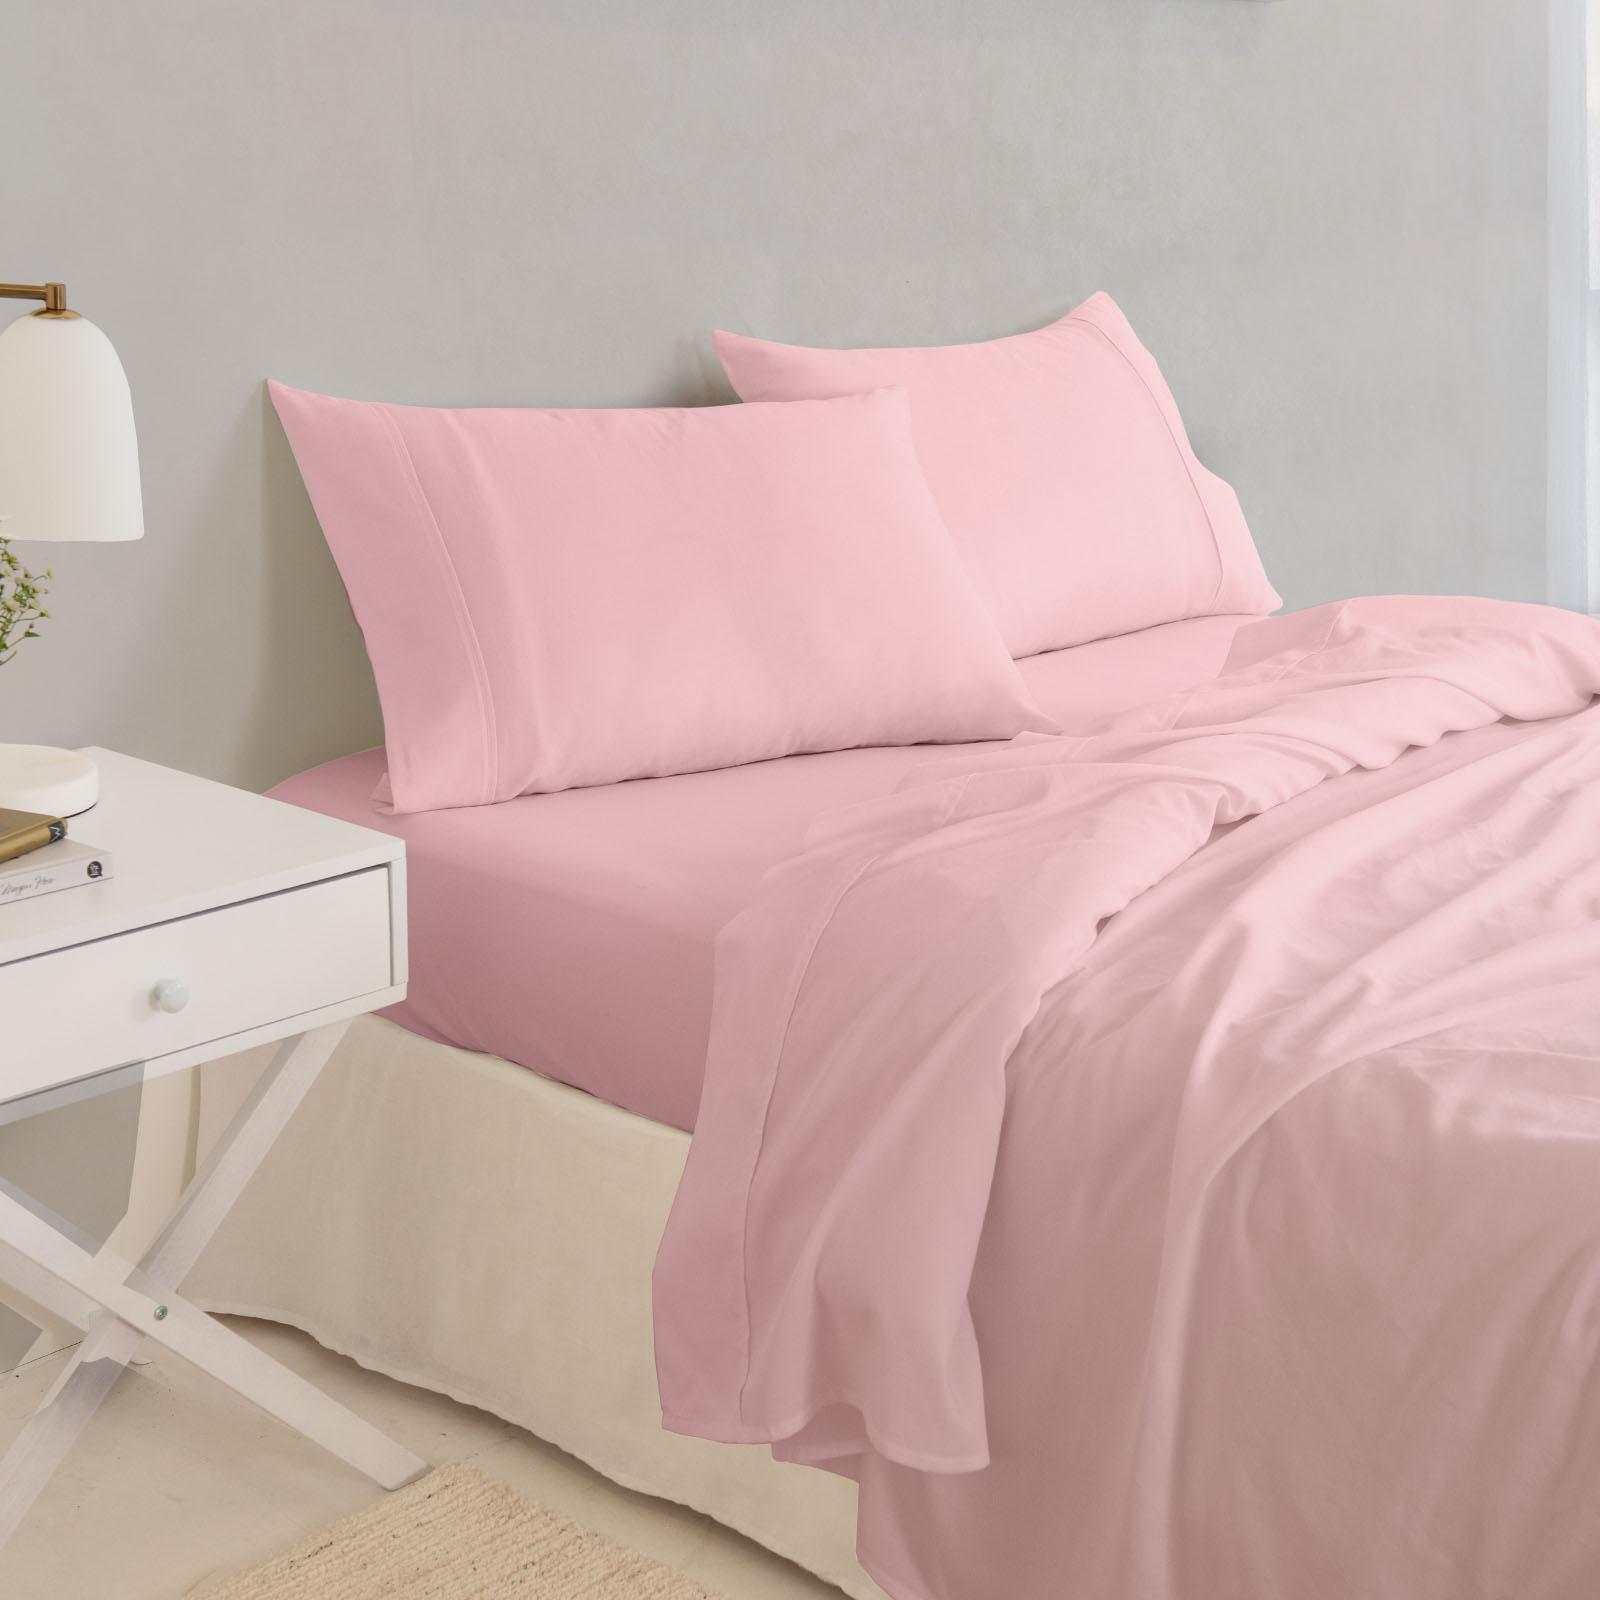 thumbnail 19 - Royal Comfort 1000TC Hotel Grade Bamboo Cotton Sheets Pillowcases Set Ultrasoft